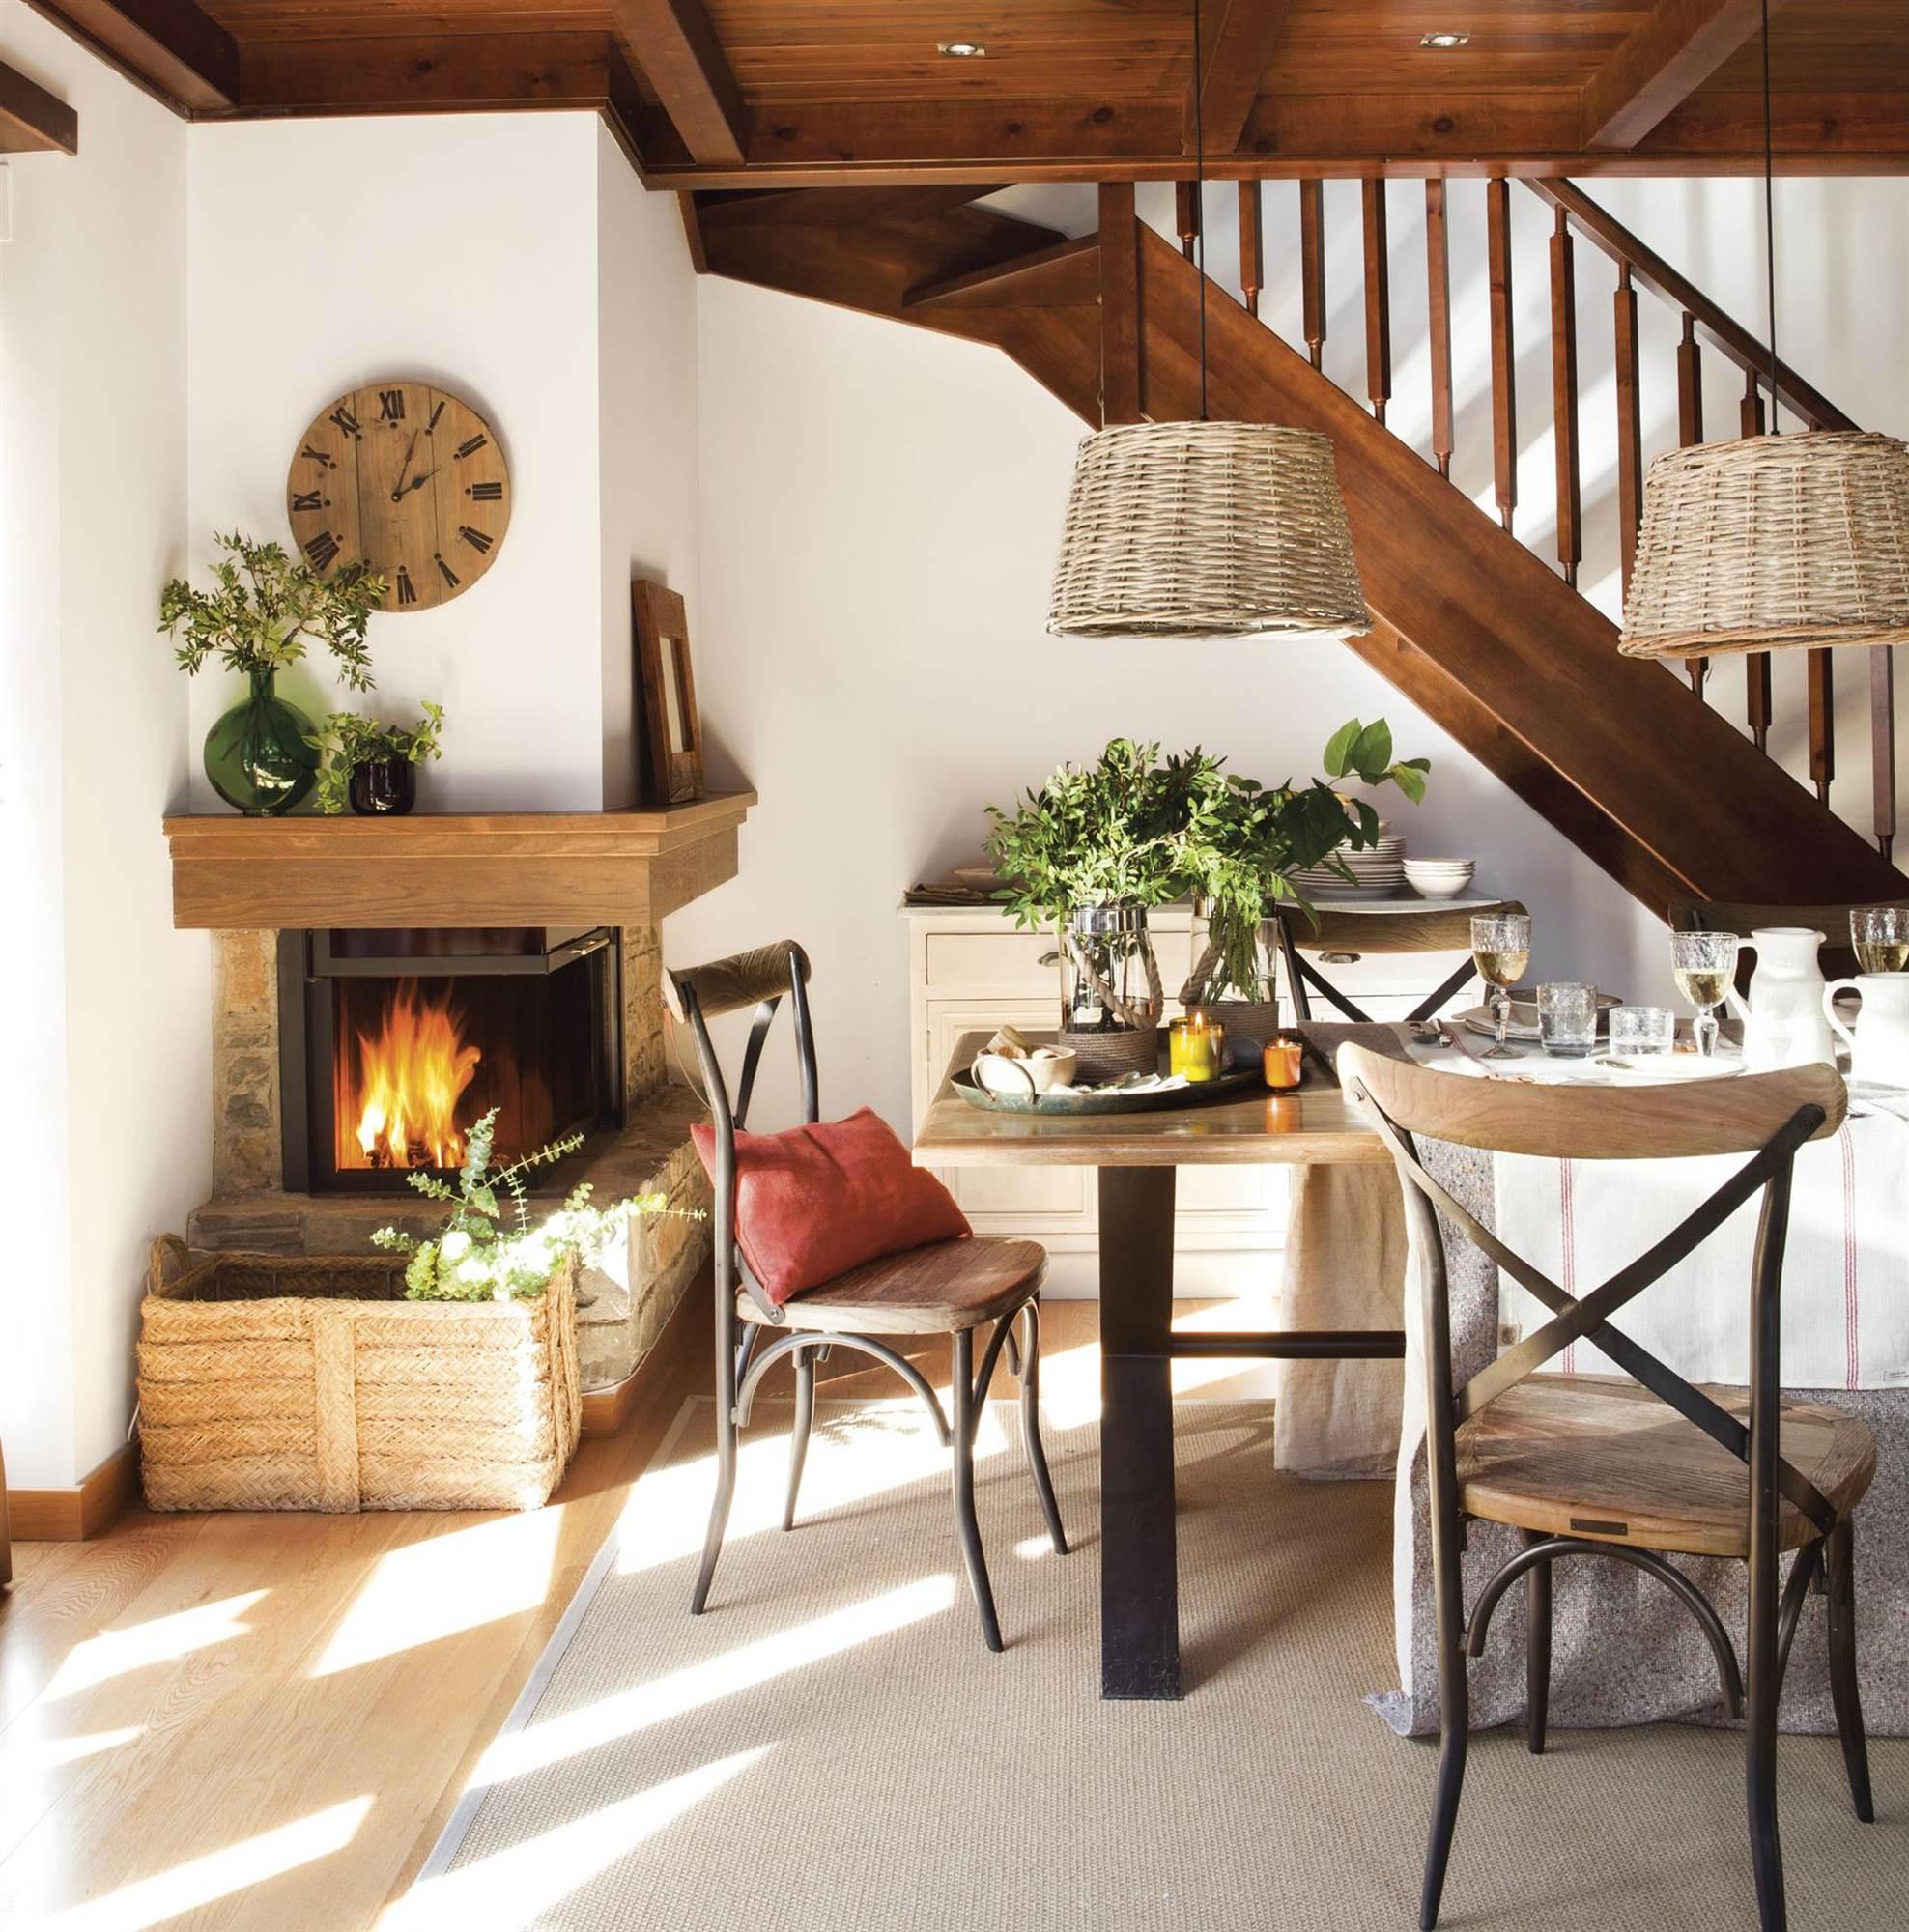 Instalar chimenea en piso beautiful chimenea suspendida - Poner chimenea piso ...